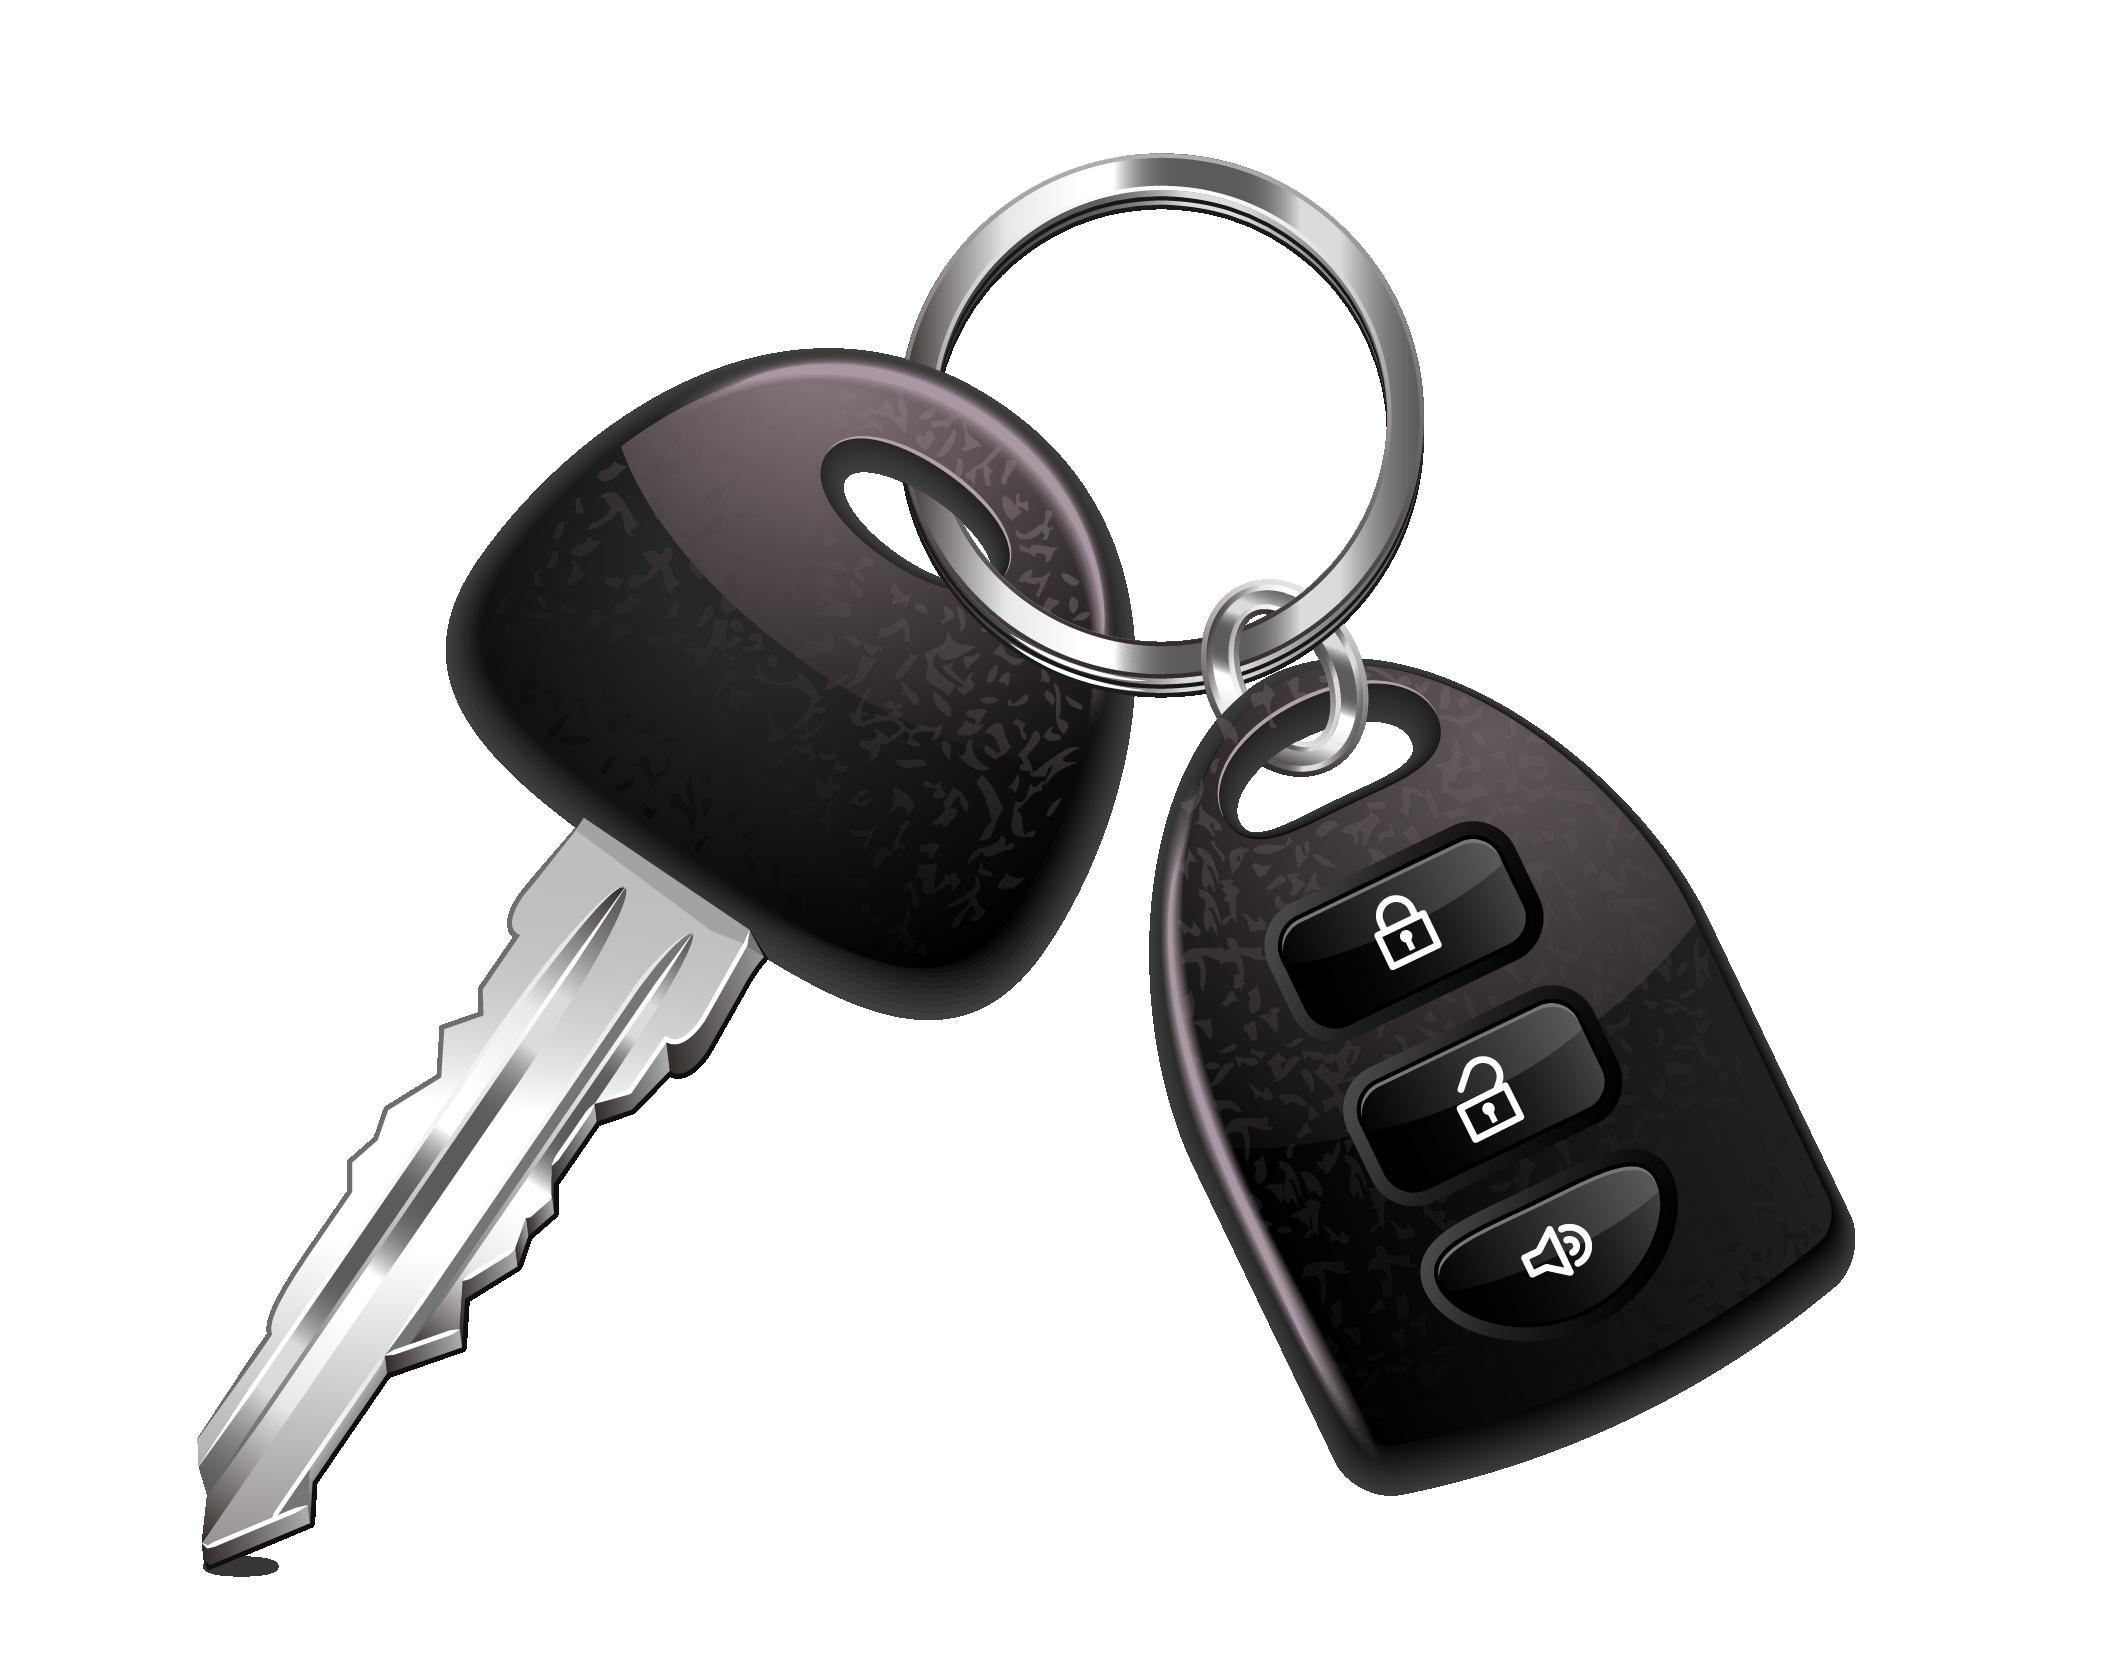 clipart black and white stock Key chain clipart. Transponder car clip art